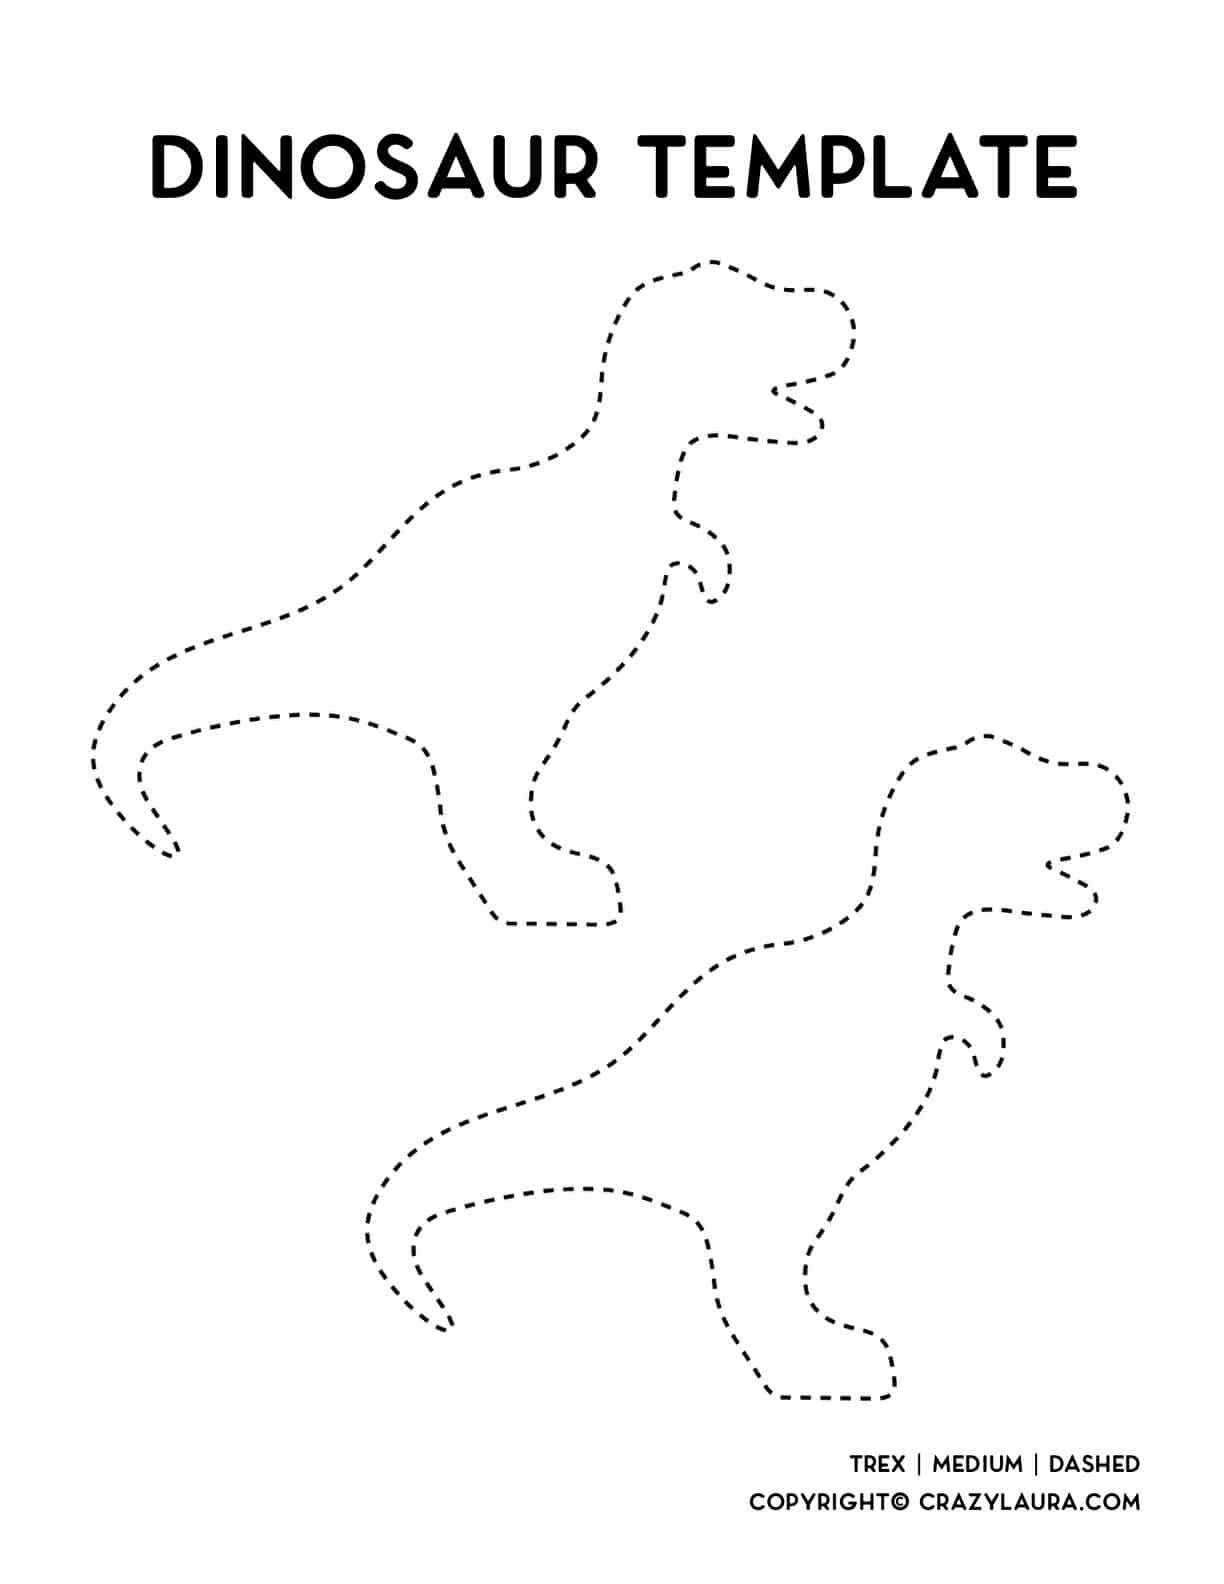 trex dinosaur free template download